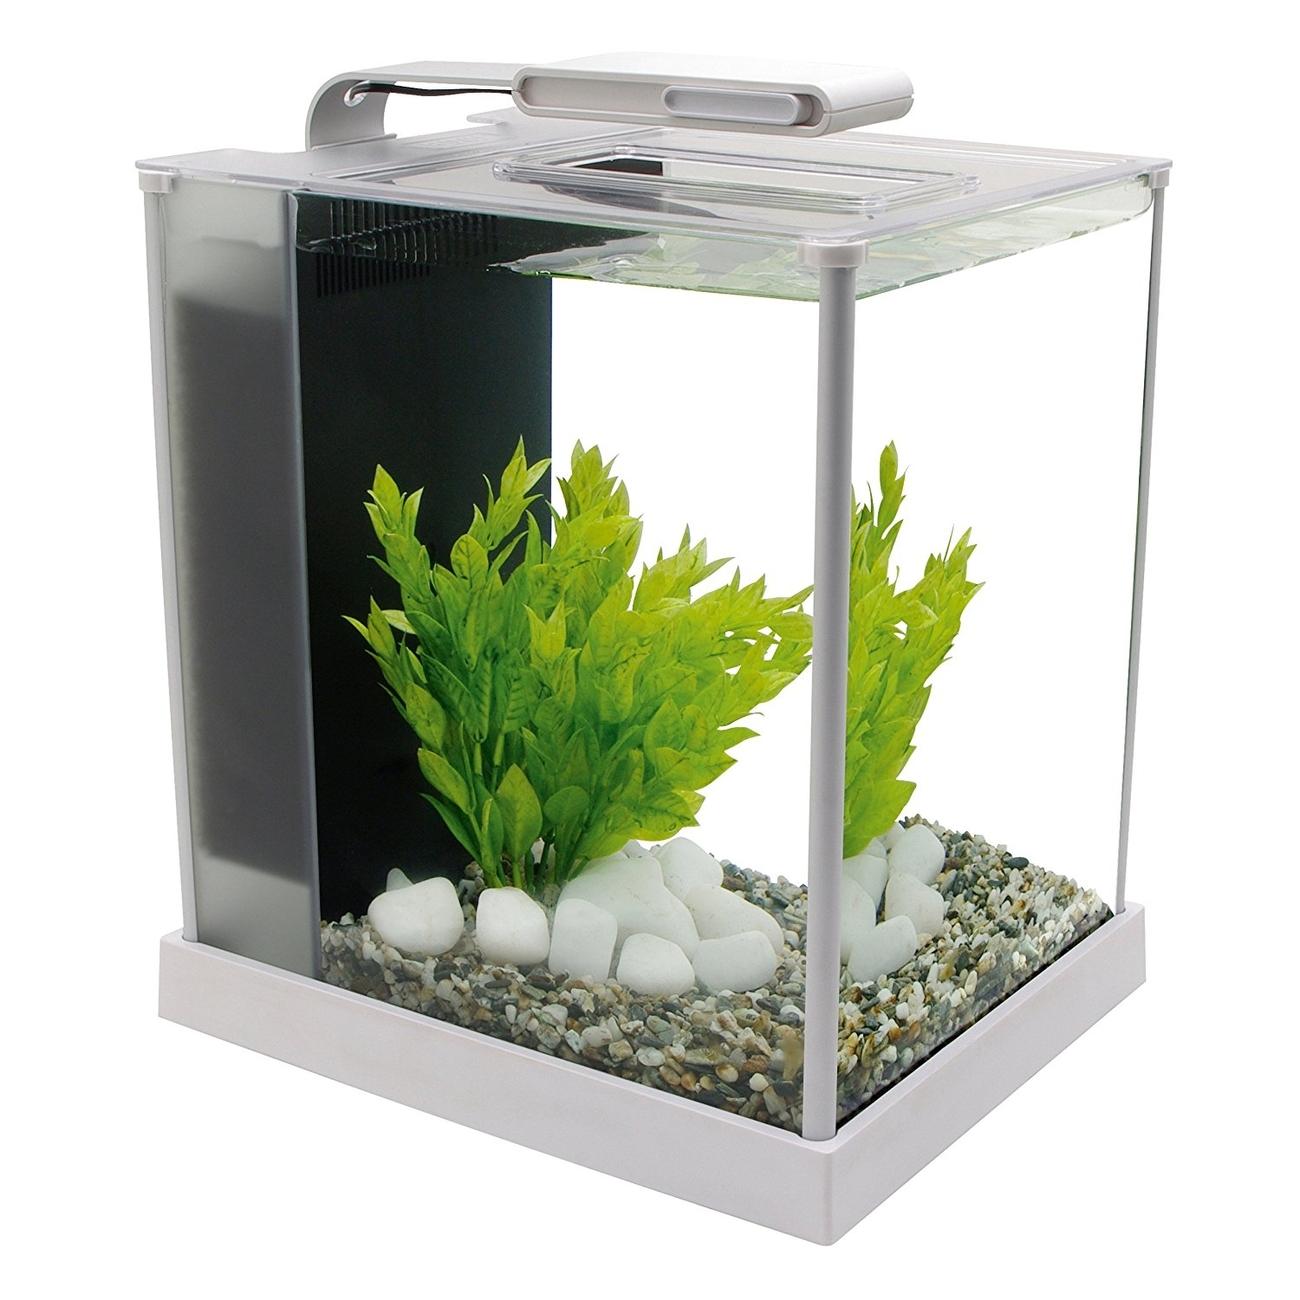 Hagen Fluval SPEC Süßwasser Aquarium Set, SPEC - 10,7 l weiß (22,3 x 32,5 x 27,5 cm)